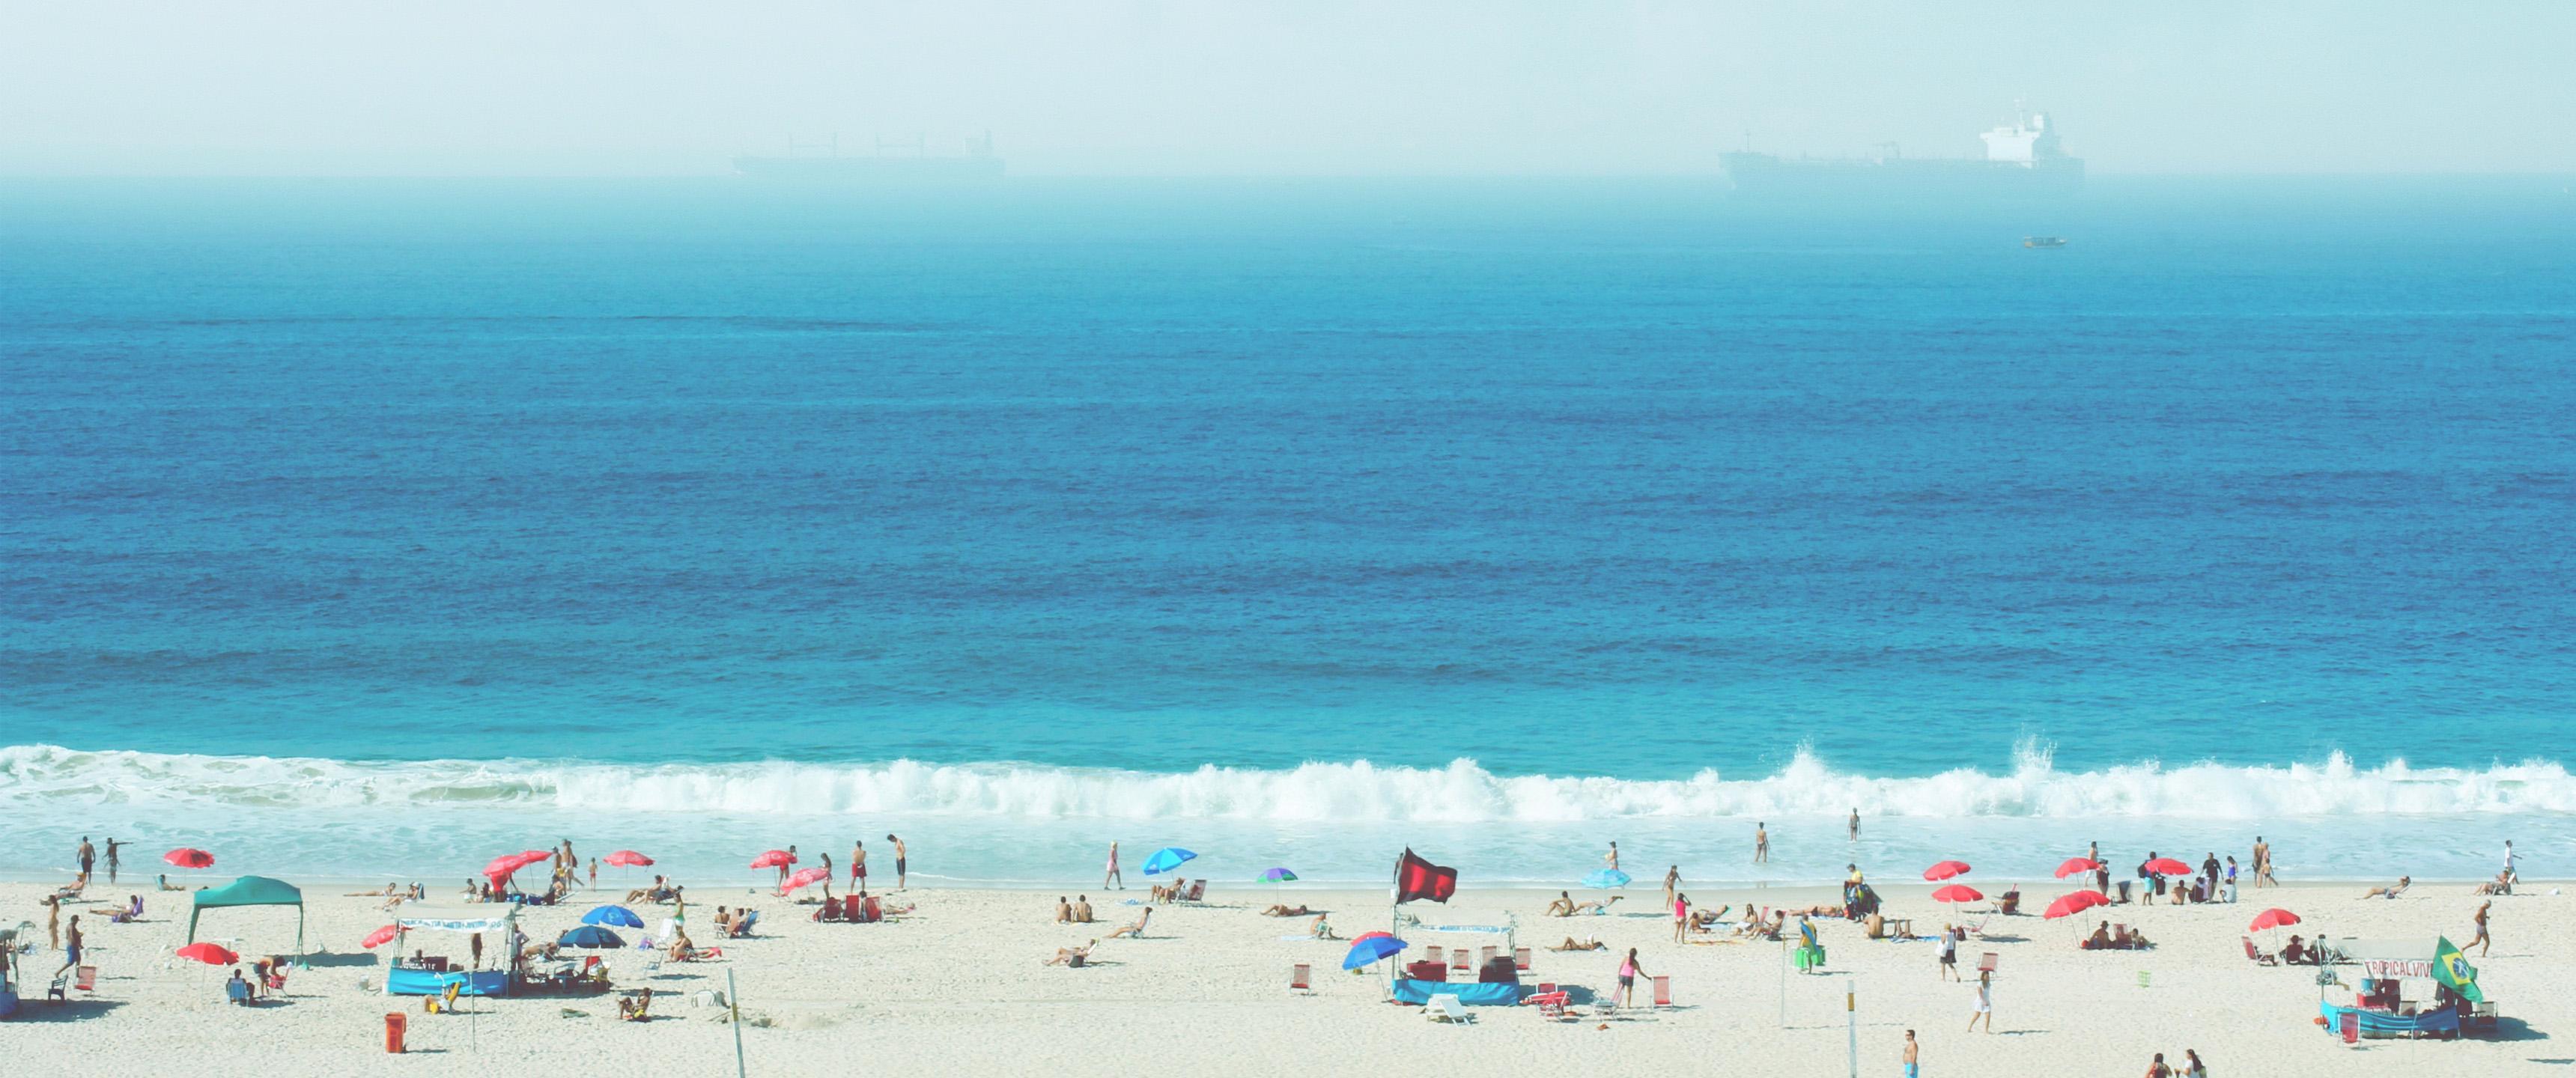 80s Beach 219 Wallpaper Ultrawide Monitor 219 Wallpapers